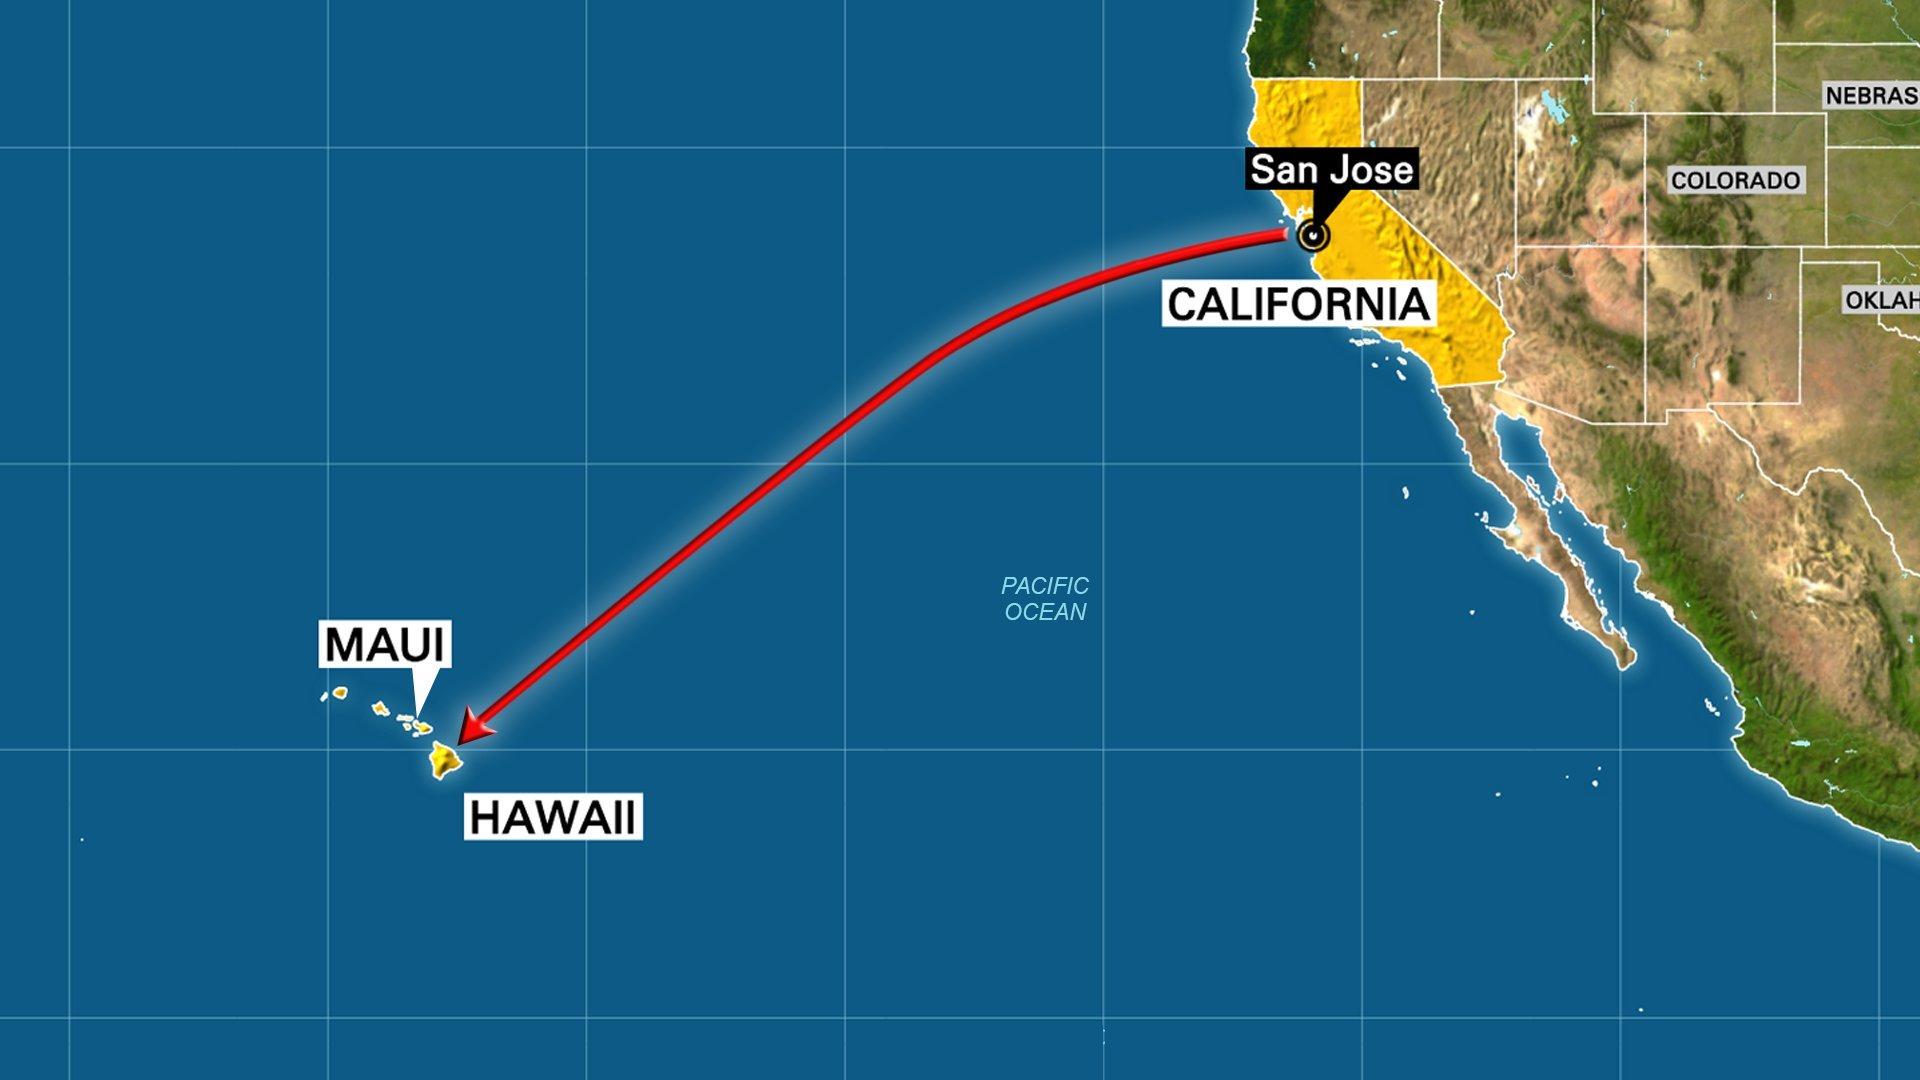 S California State Map Map From California To Hawaii - Klipy - Hawaii California Map